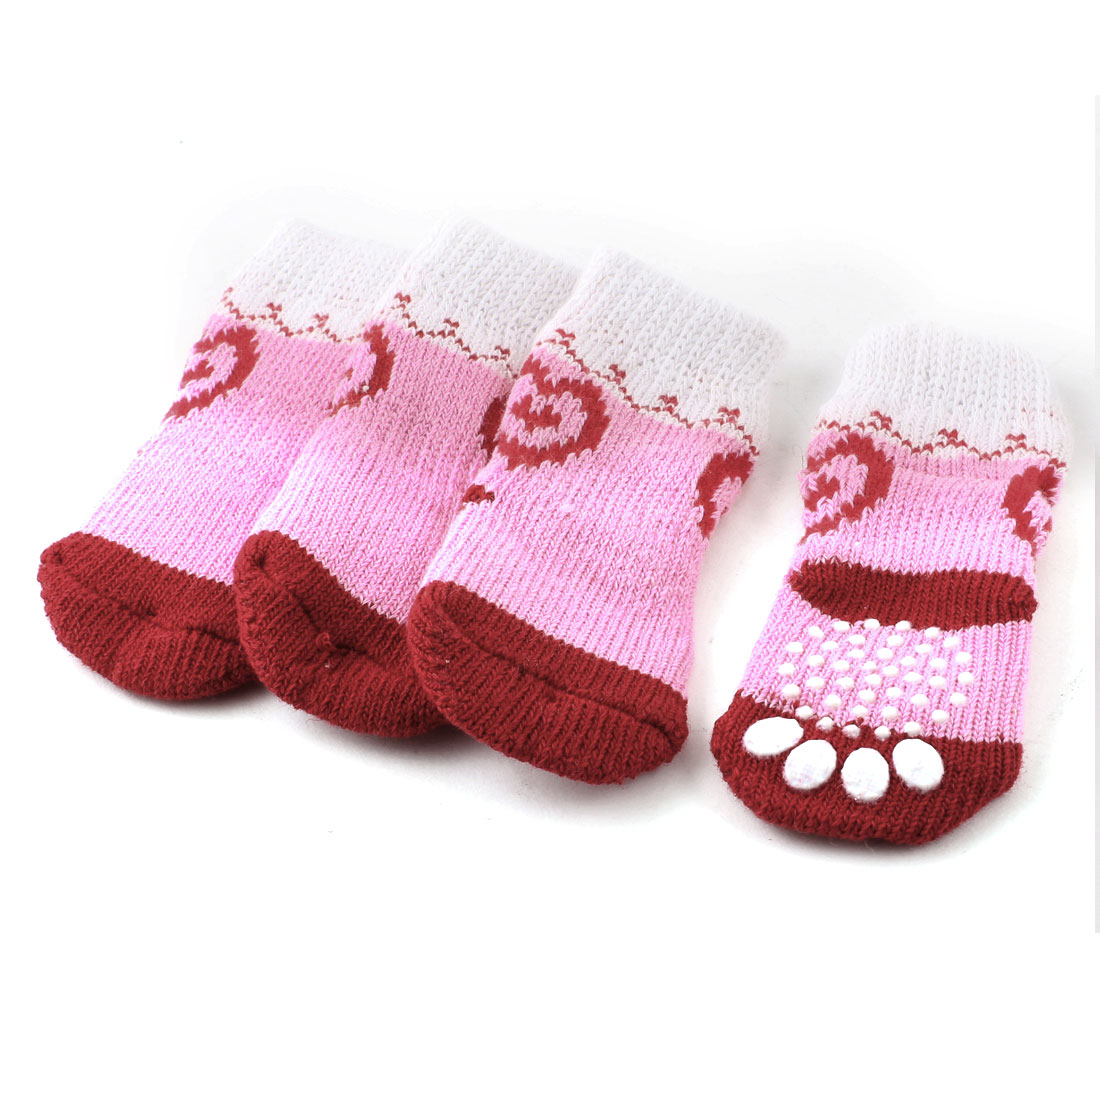 Pink White Knitting Heart Paw Pattern Elastic Pet Yorkie Dog Socks 2 Pairs